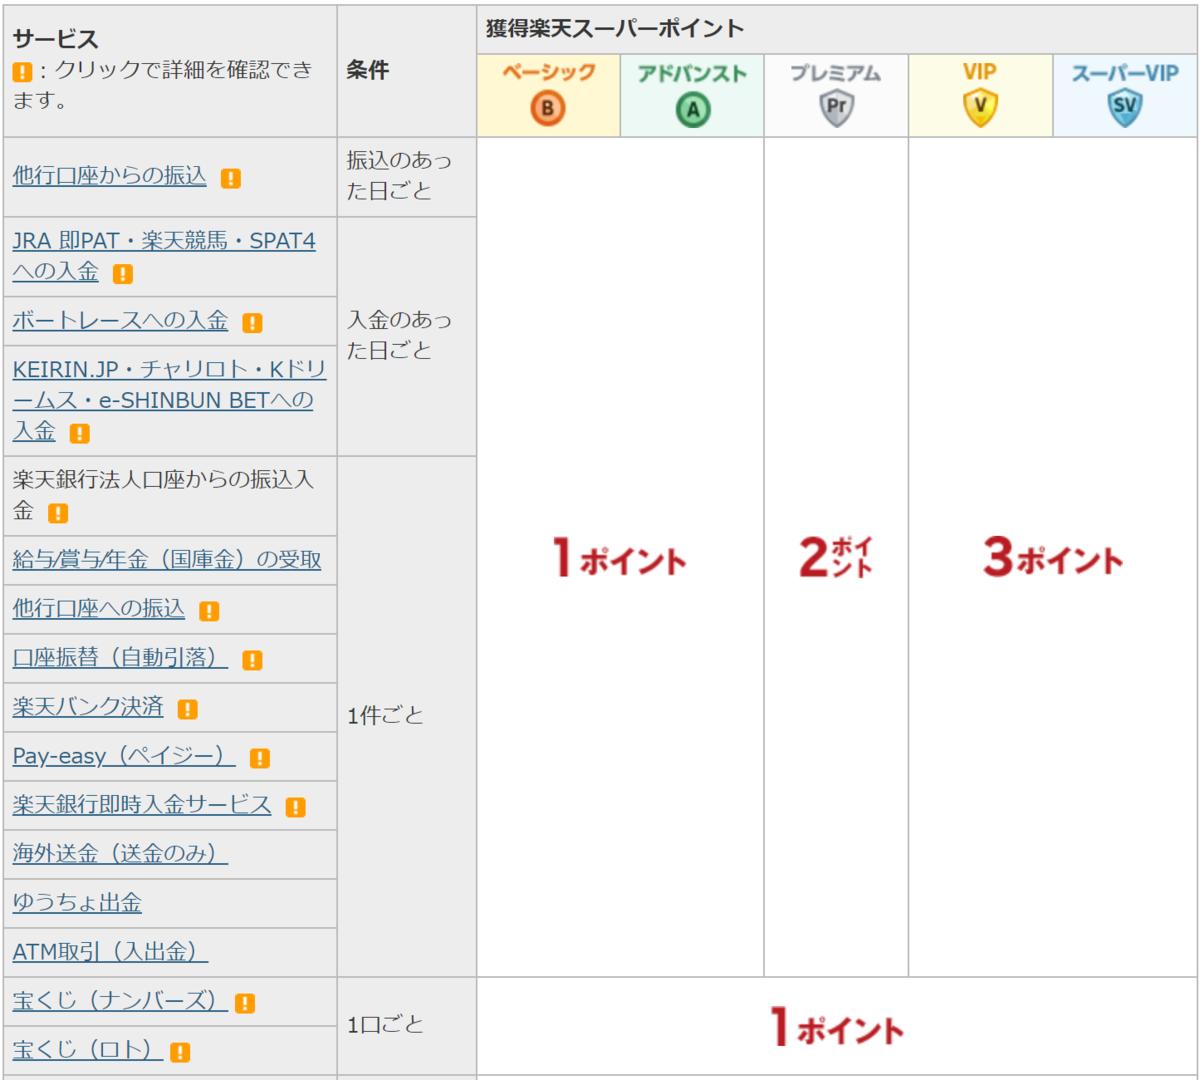 f:id:Sabuaka:20190315200351p:plain